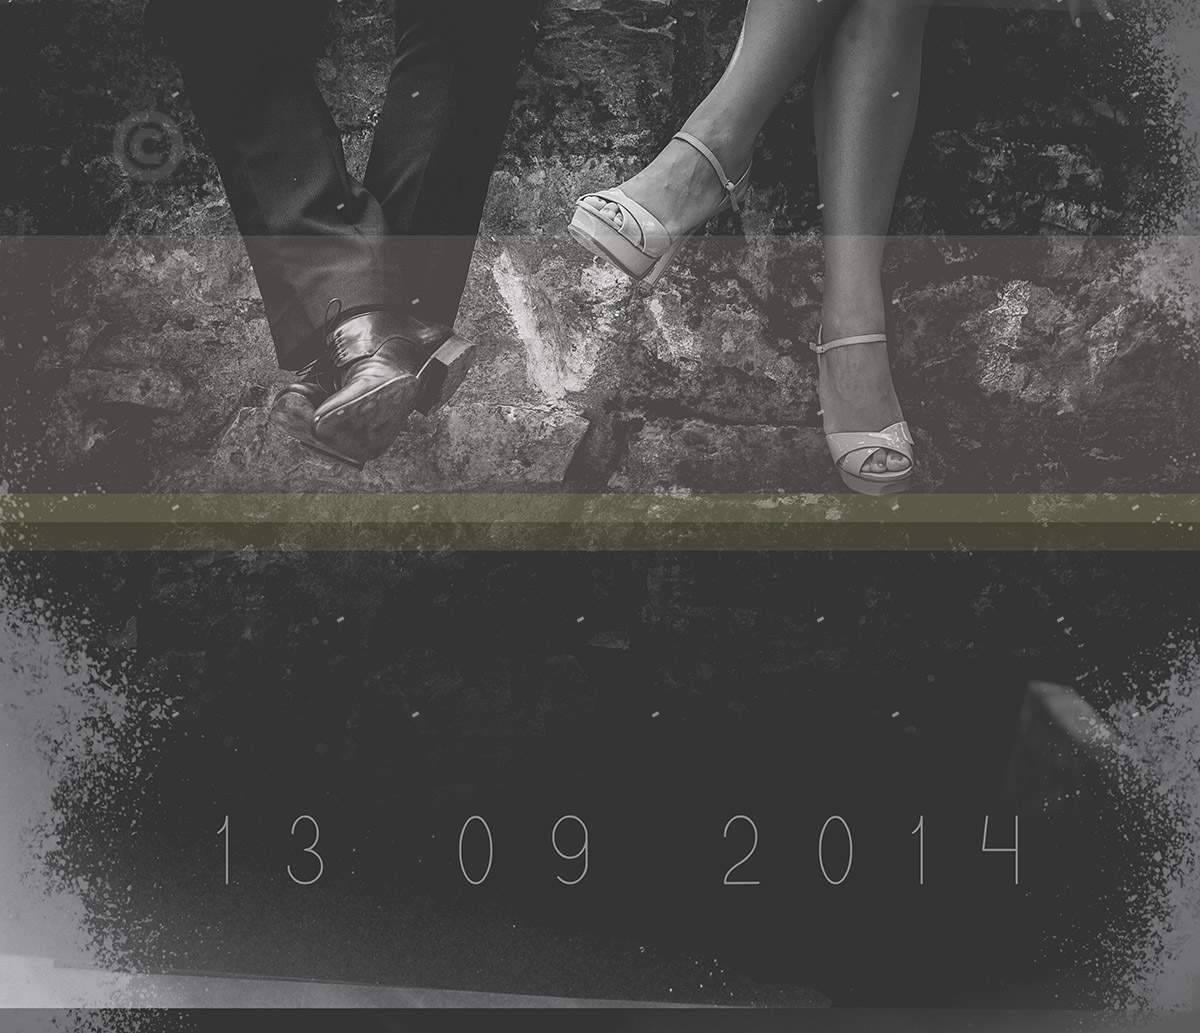 Pelion, the photo album   ψηφιακά άλμπουμ γάμου και βάπτισης   wedding photo albums